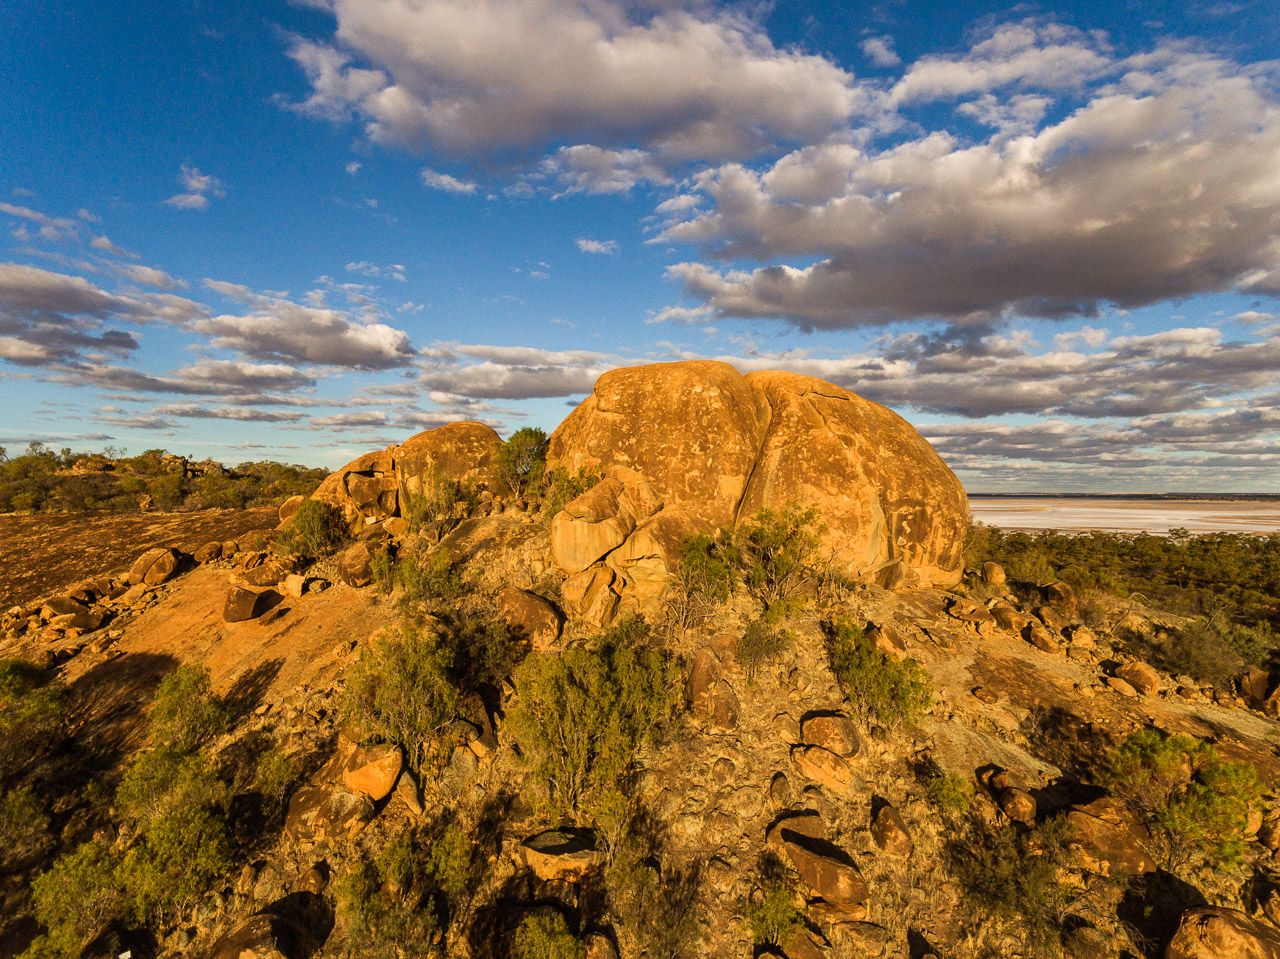 Drone image of Eaglestone Rock and Lake Brown in the Wheatbelt, WA